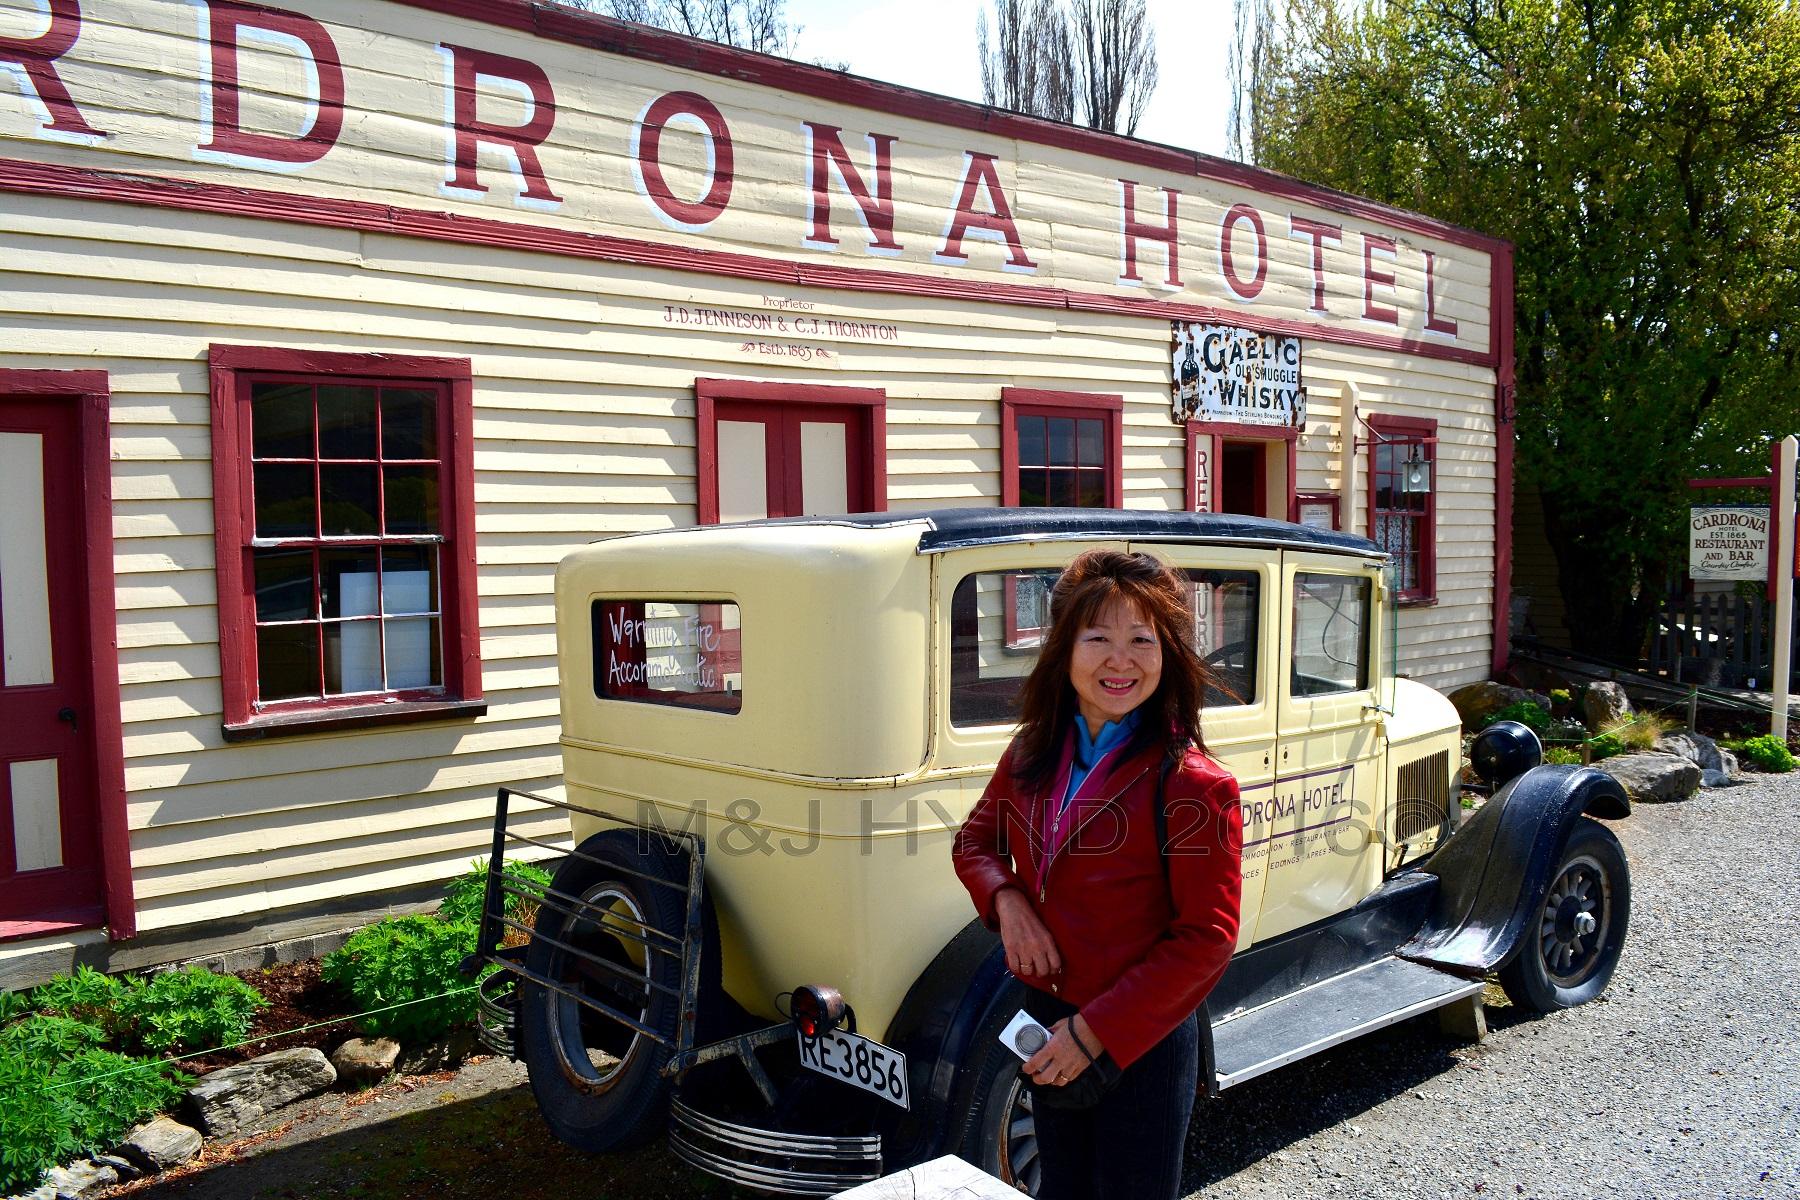 Cardrona Hotel, 1926 Chrysler 62 vintage car, Cardrona, NZ